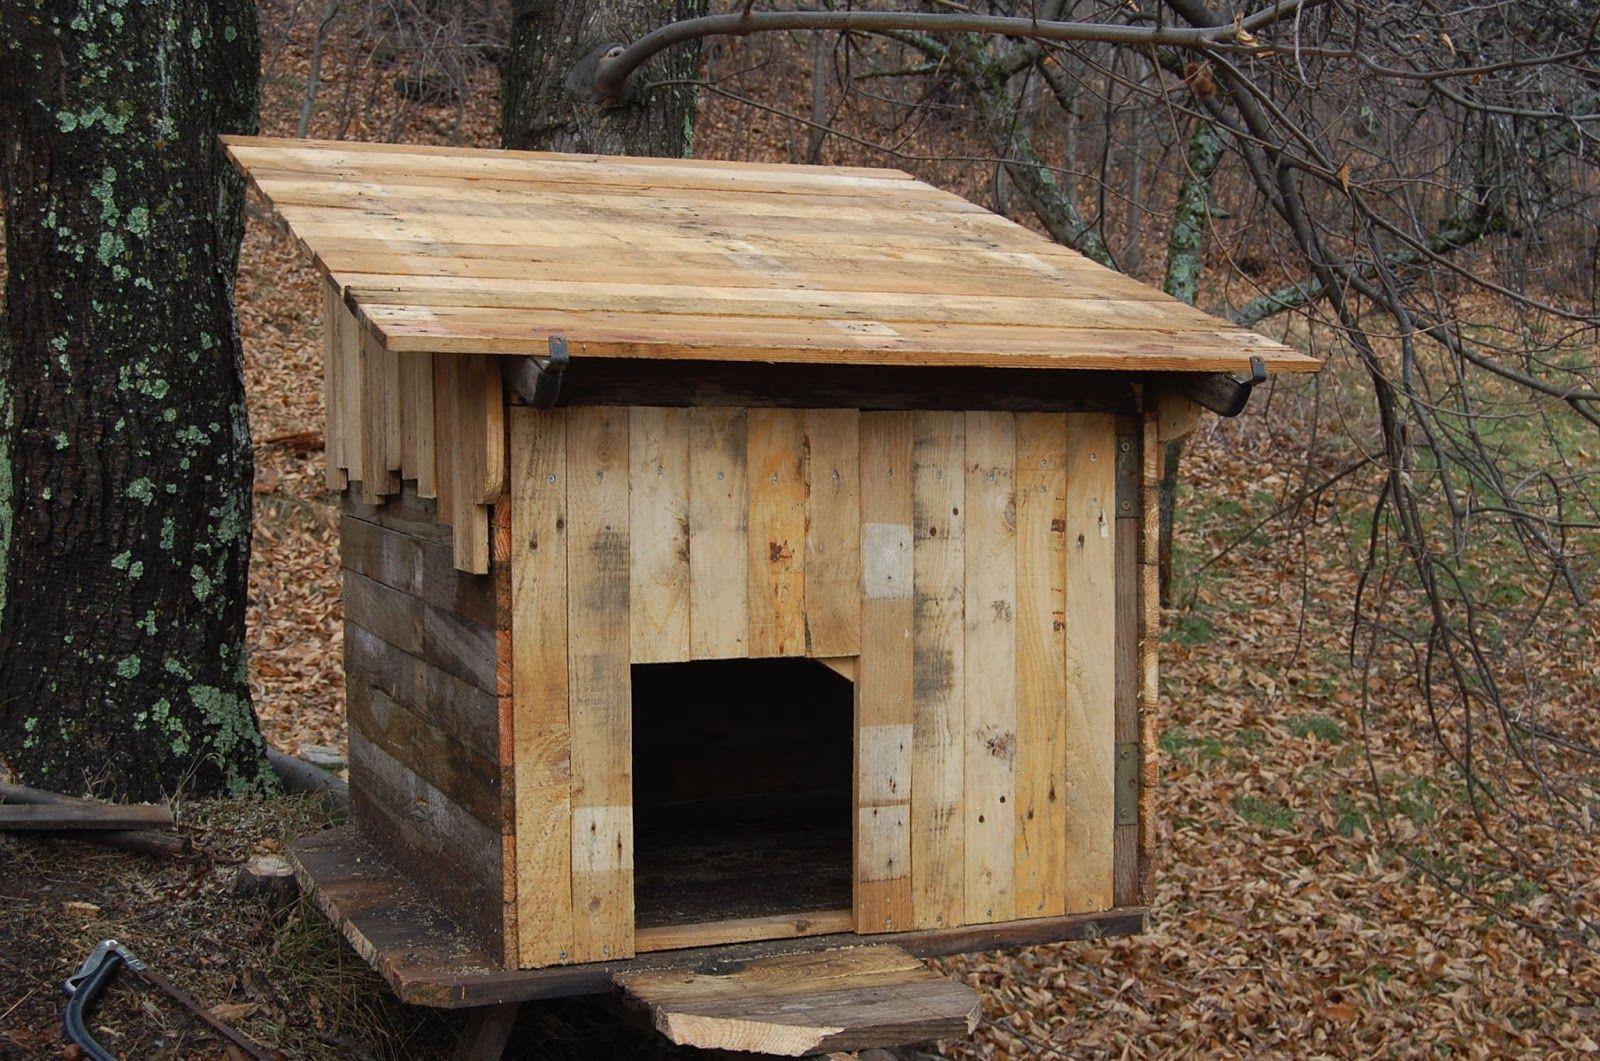 cl ture prot ge renard palettes pinterest bird houses outdoor projects et birds. Black Bedroom Furniture Sets. Home Design Ideas